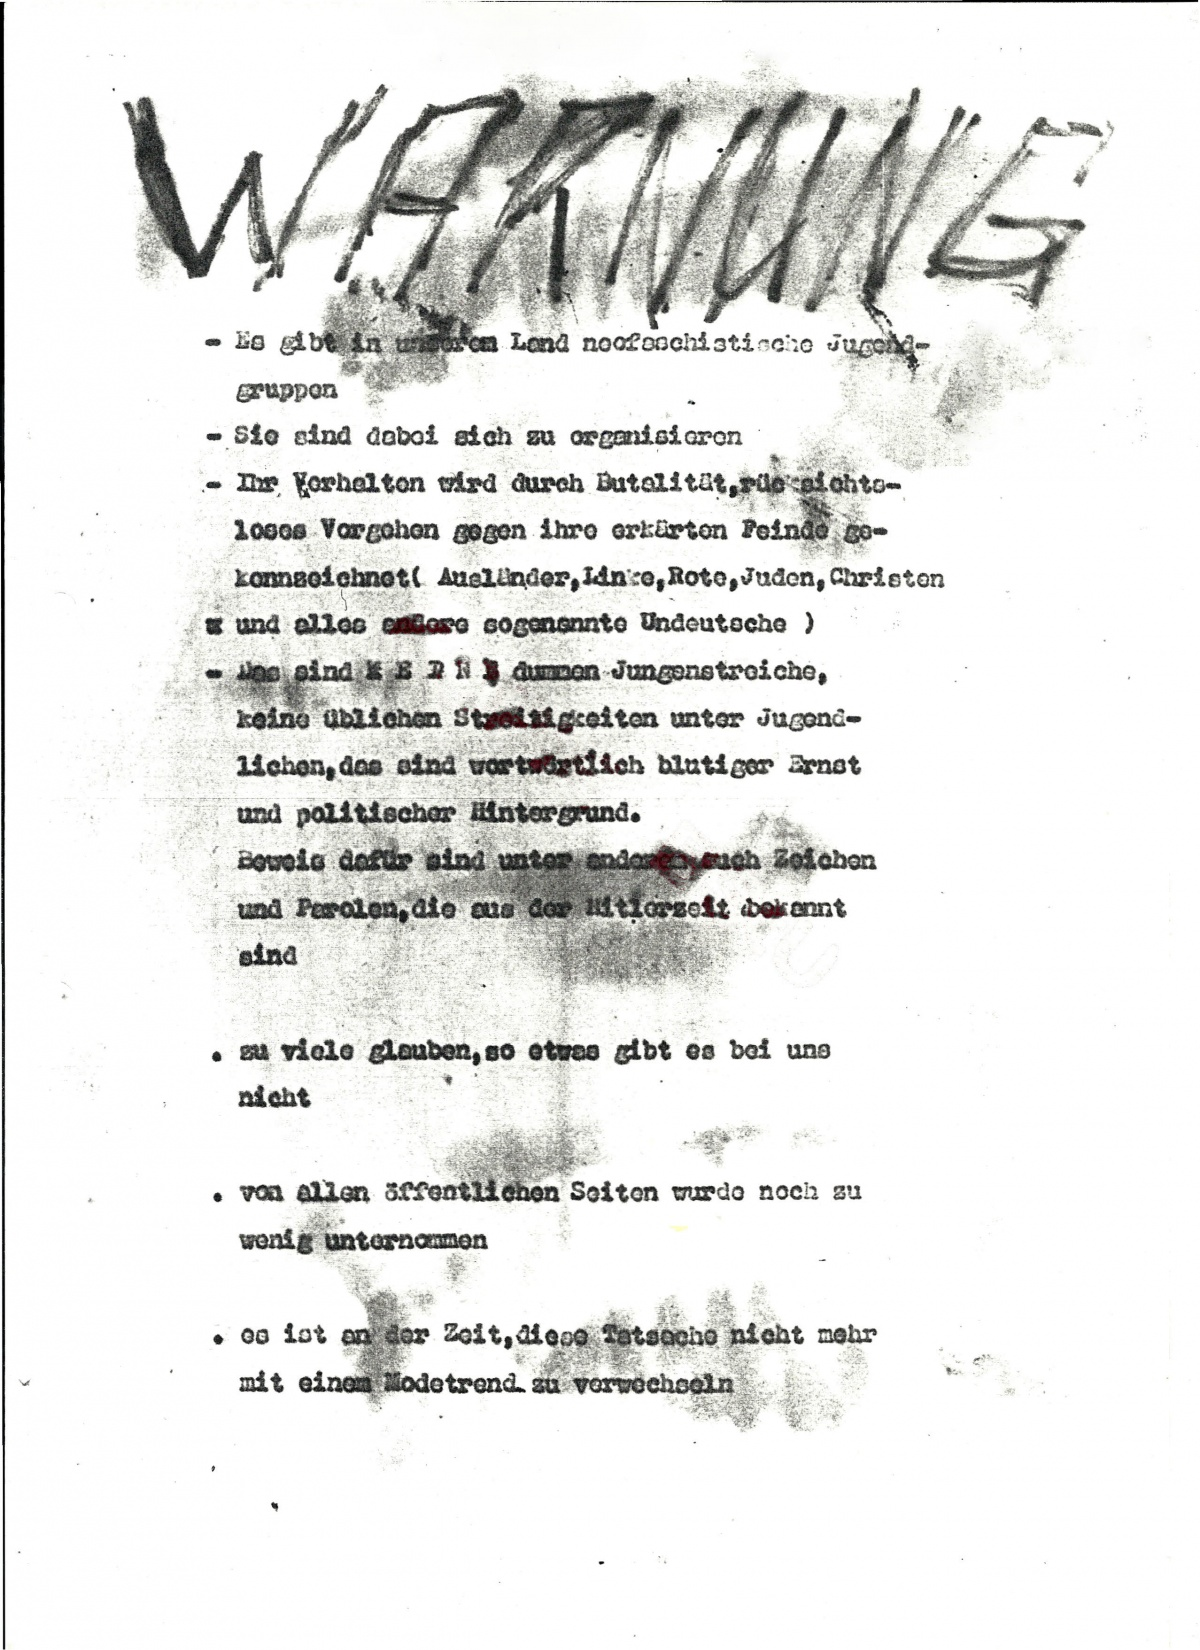 Antifa Potsdam - Flugblatt vom 6.November 1987